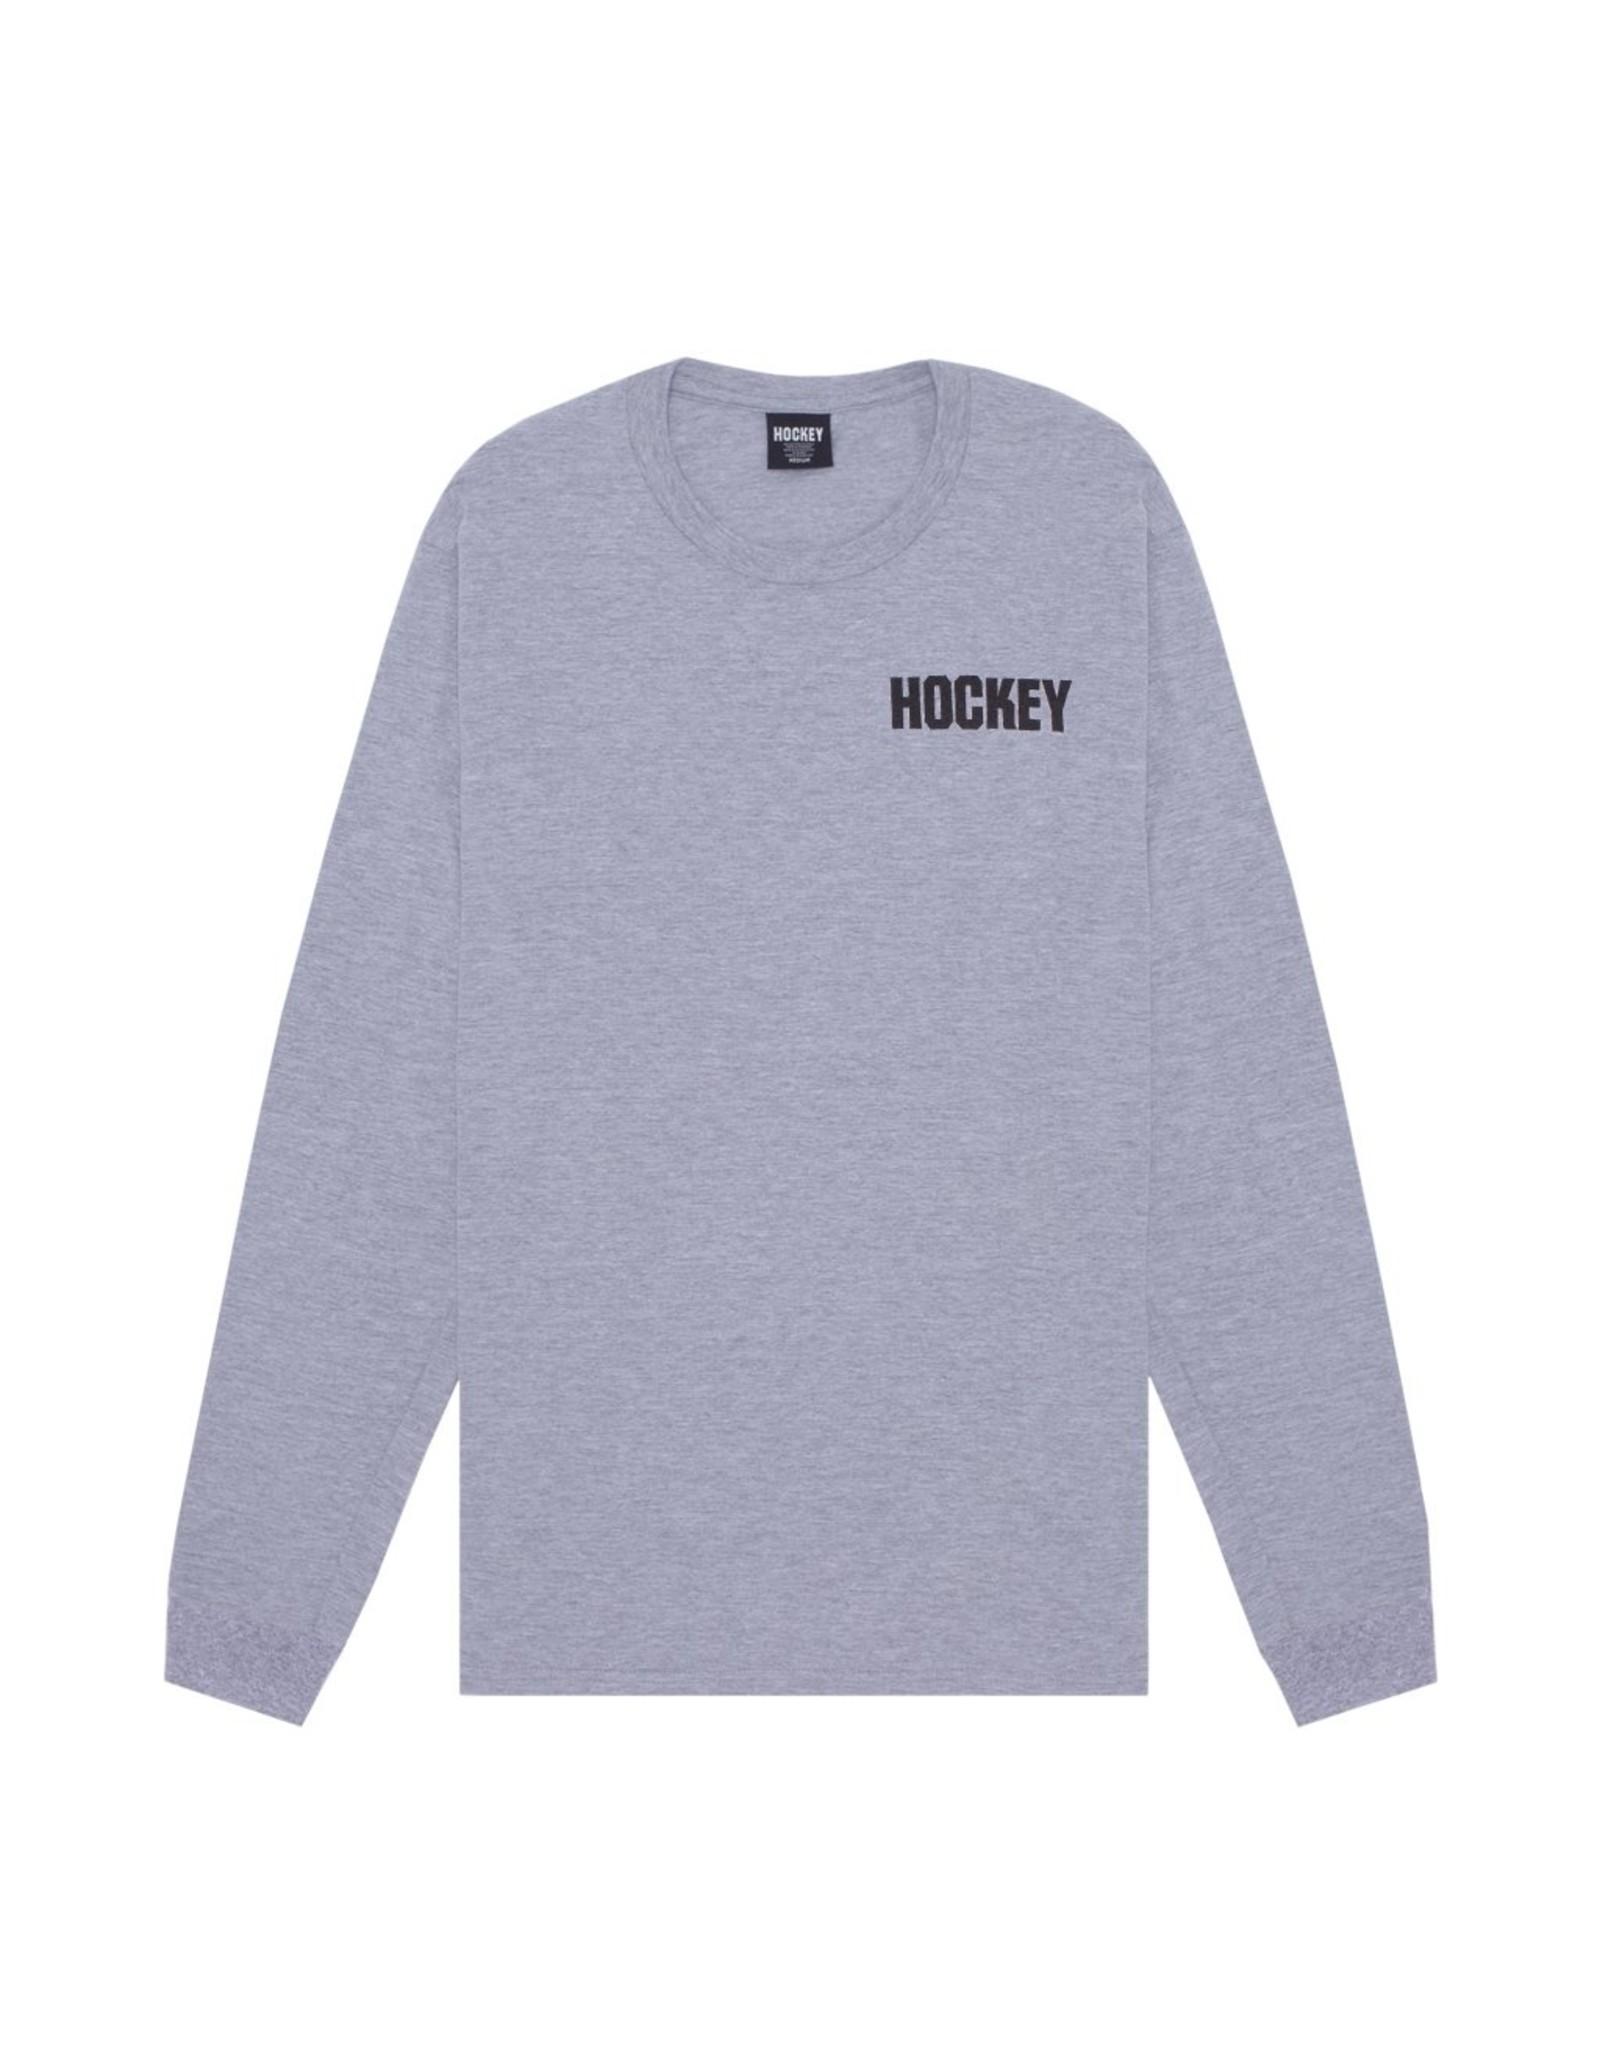 HOCKEY HOCKEY - WITCH CRAFT L/S - GREY -